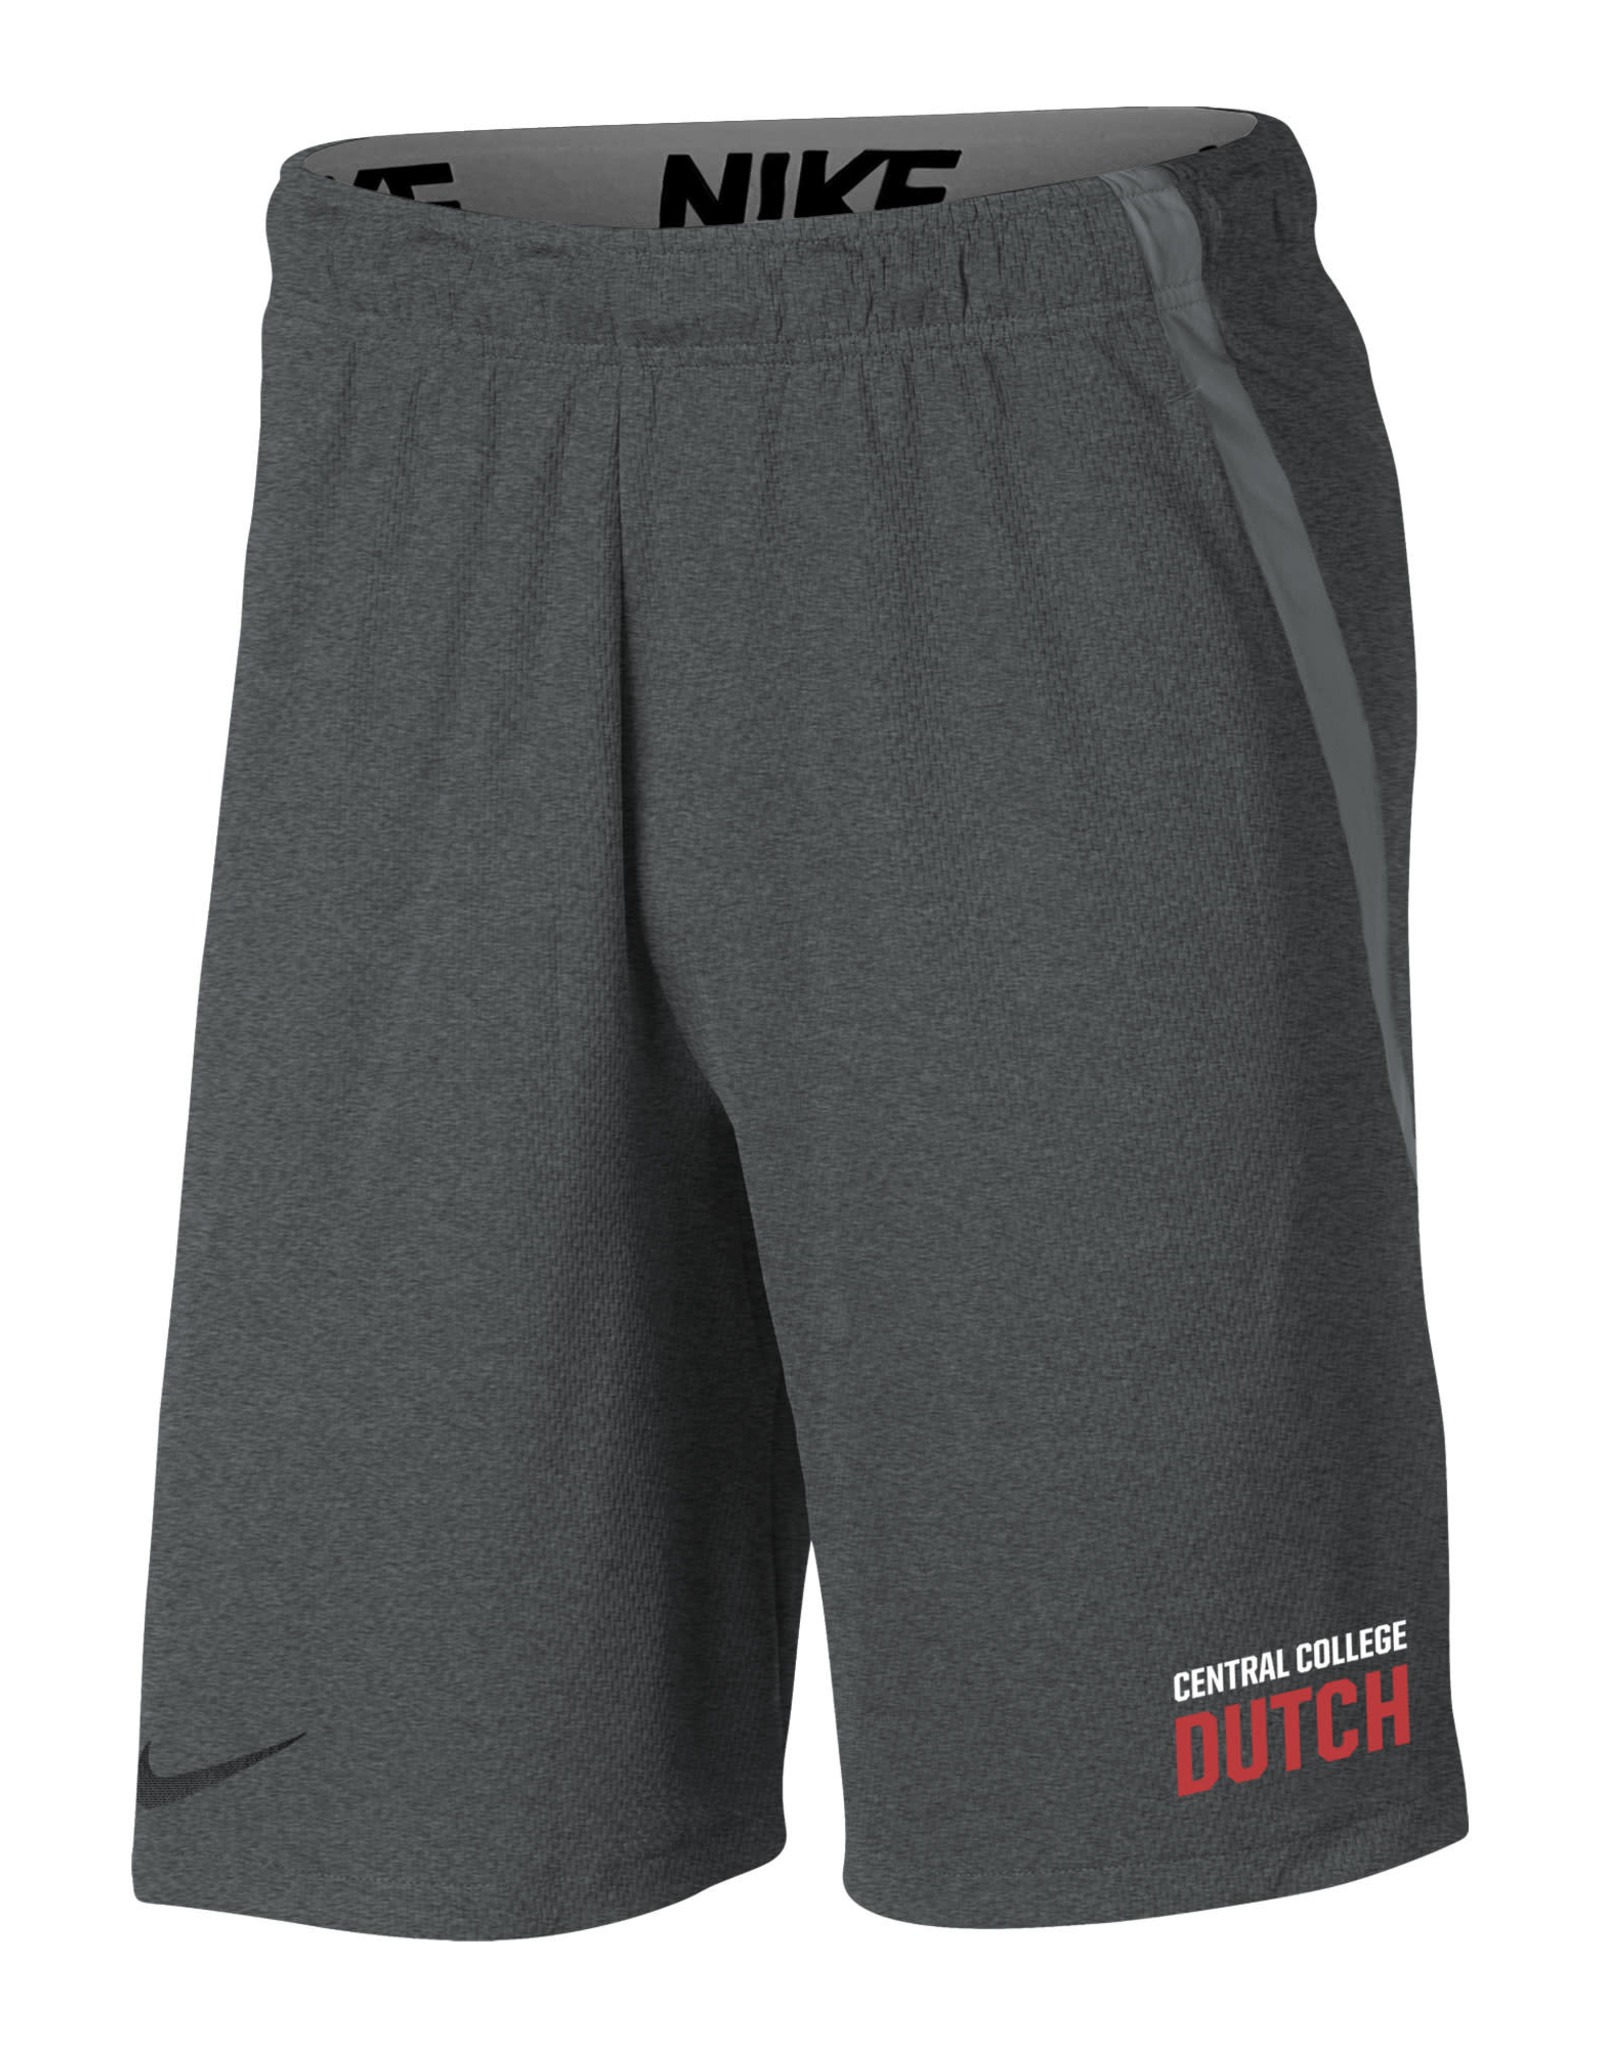 Nike Nike Hype Short Dark Heather Gray